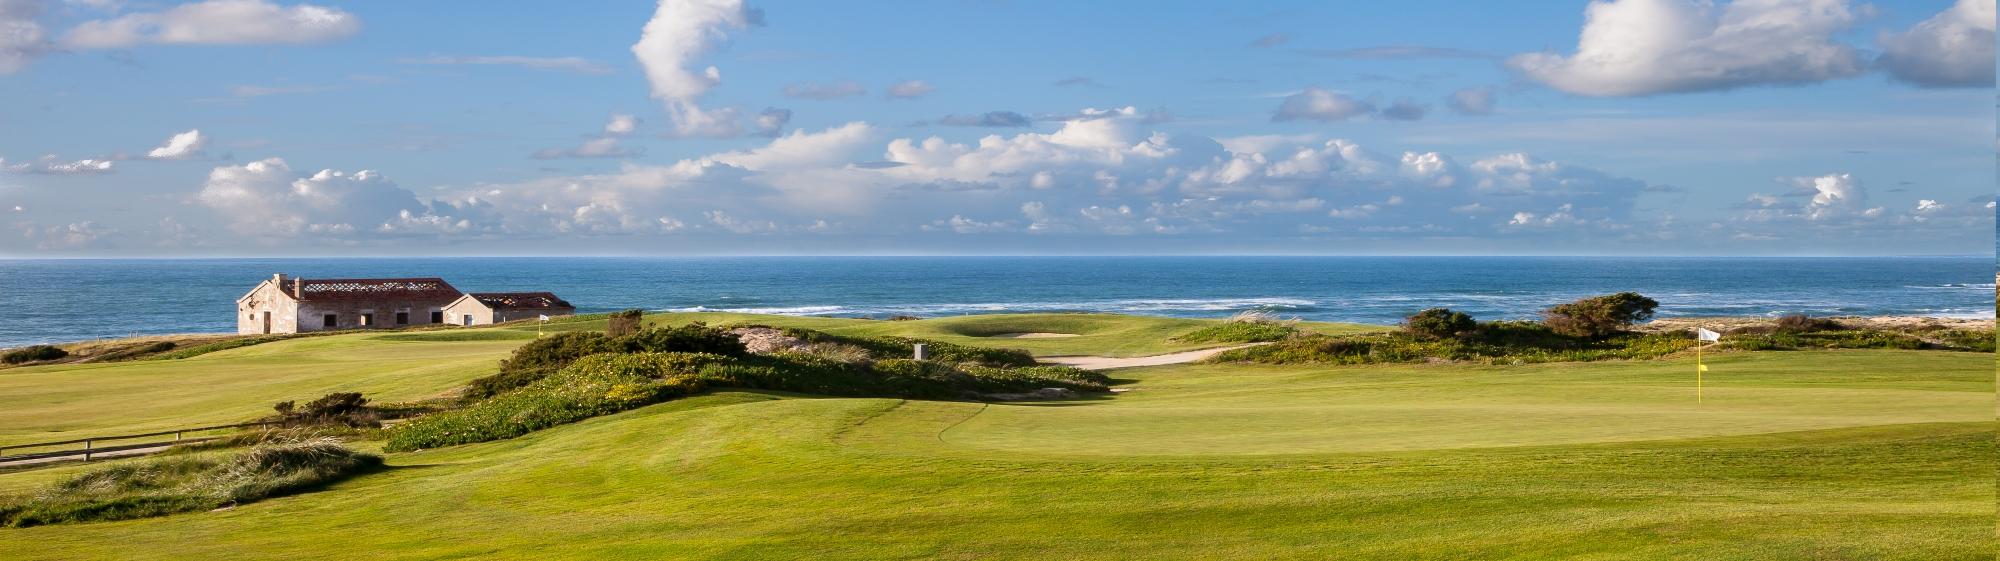 Portugal golf holiday